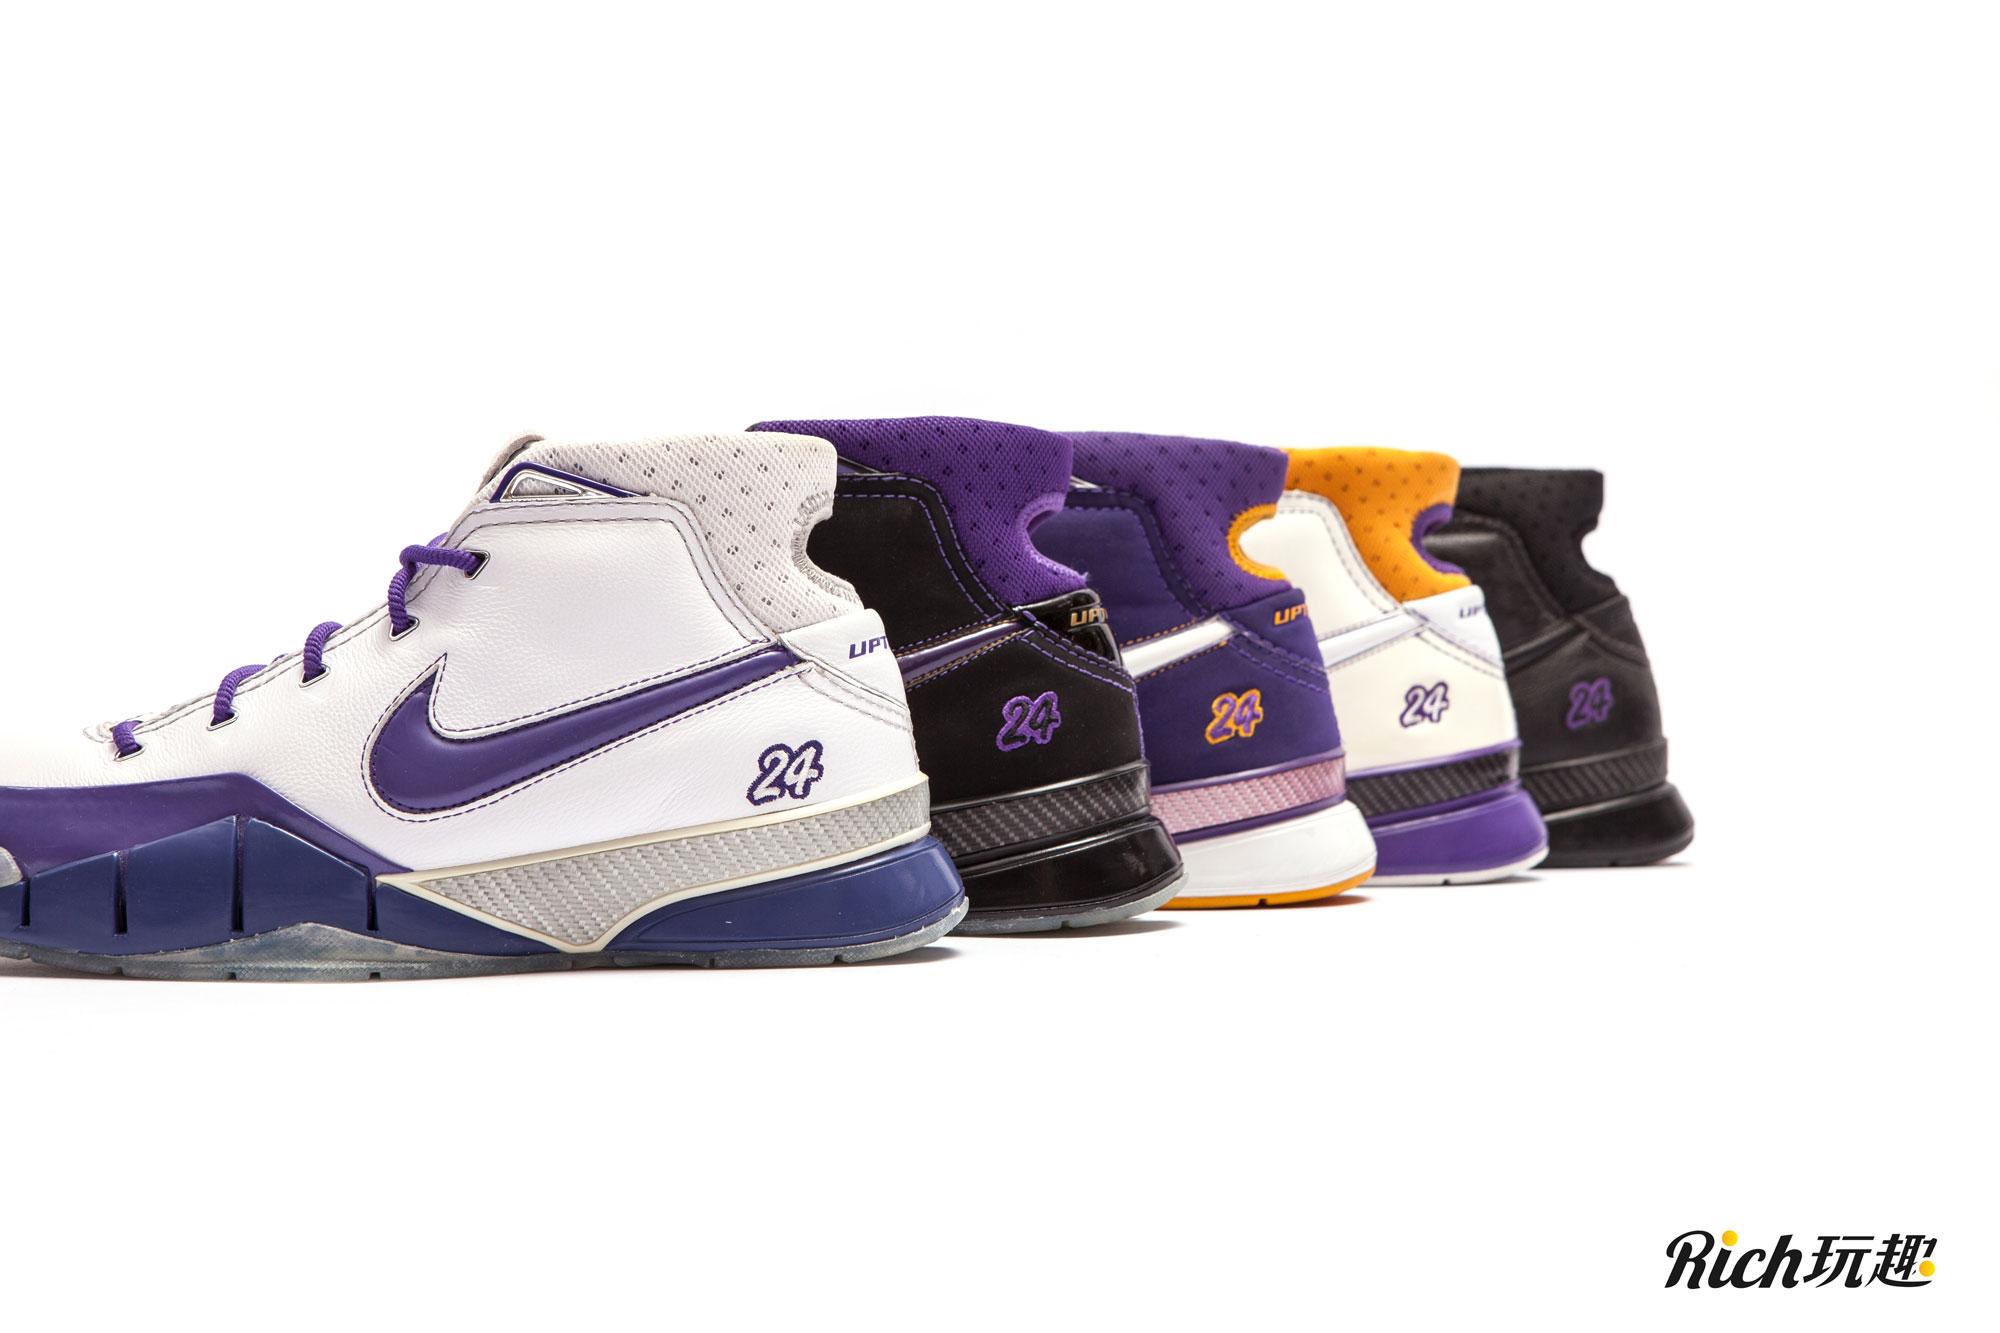 KOBE,RICH  國內首個「超限量球鞋拍賣會」!你沒見過的科比戰靴這全有!